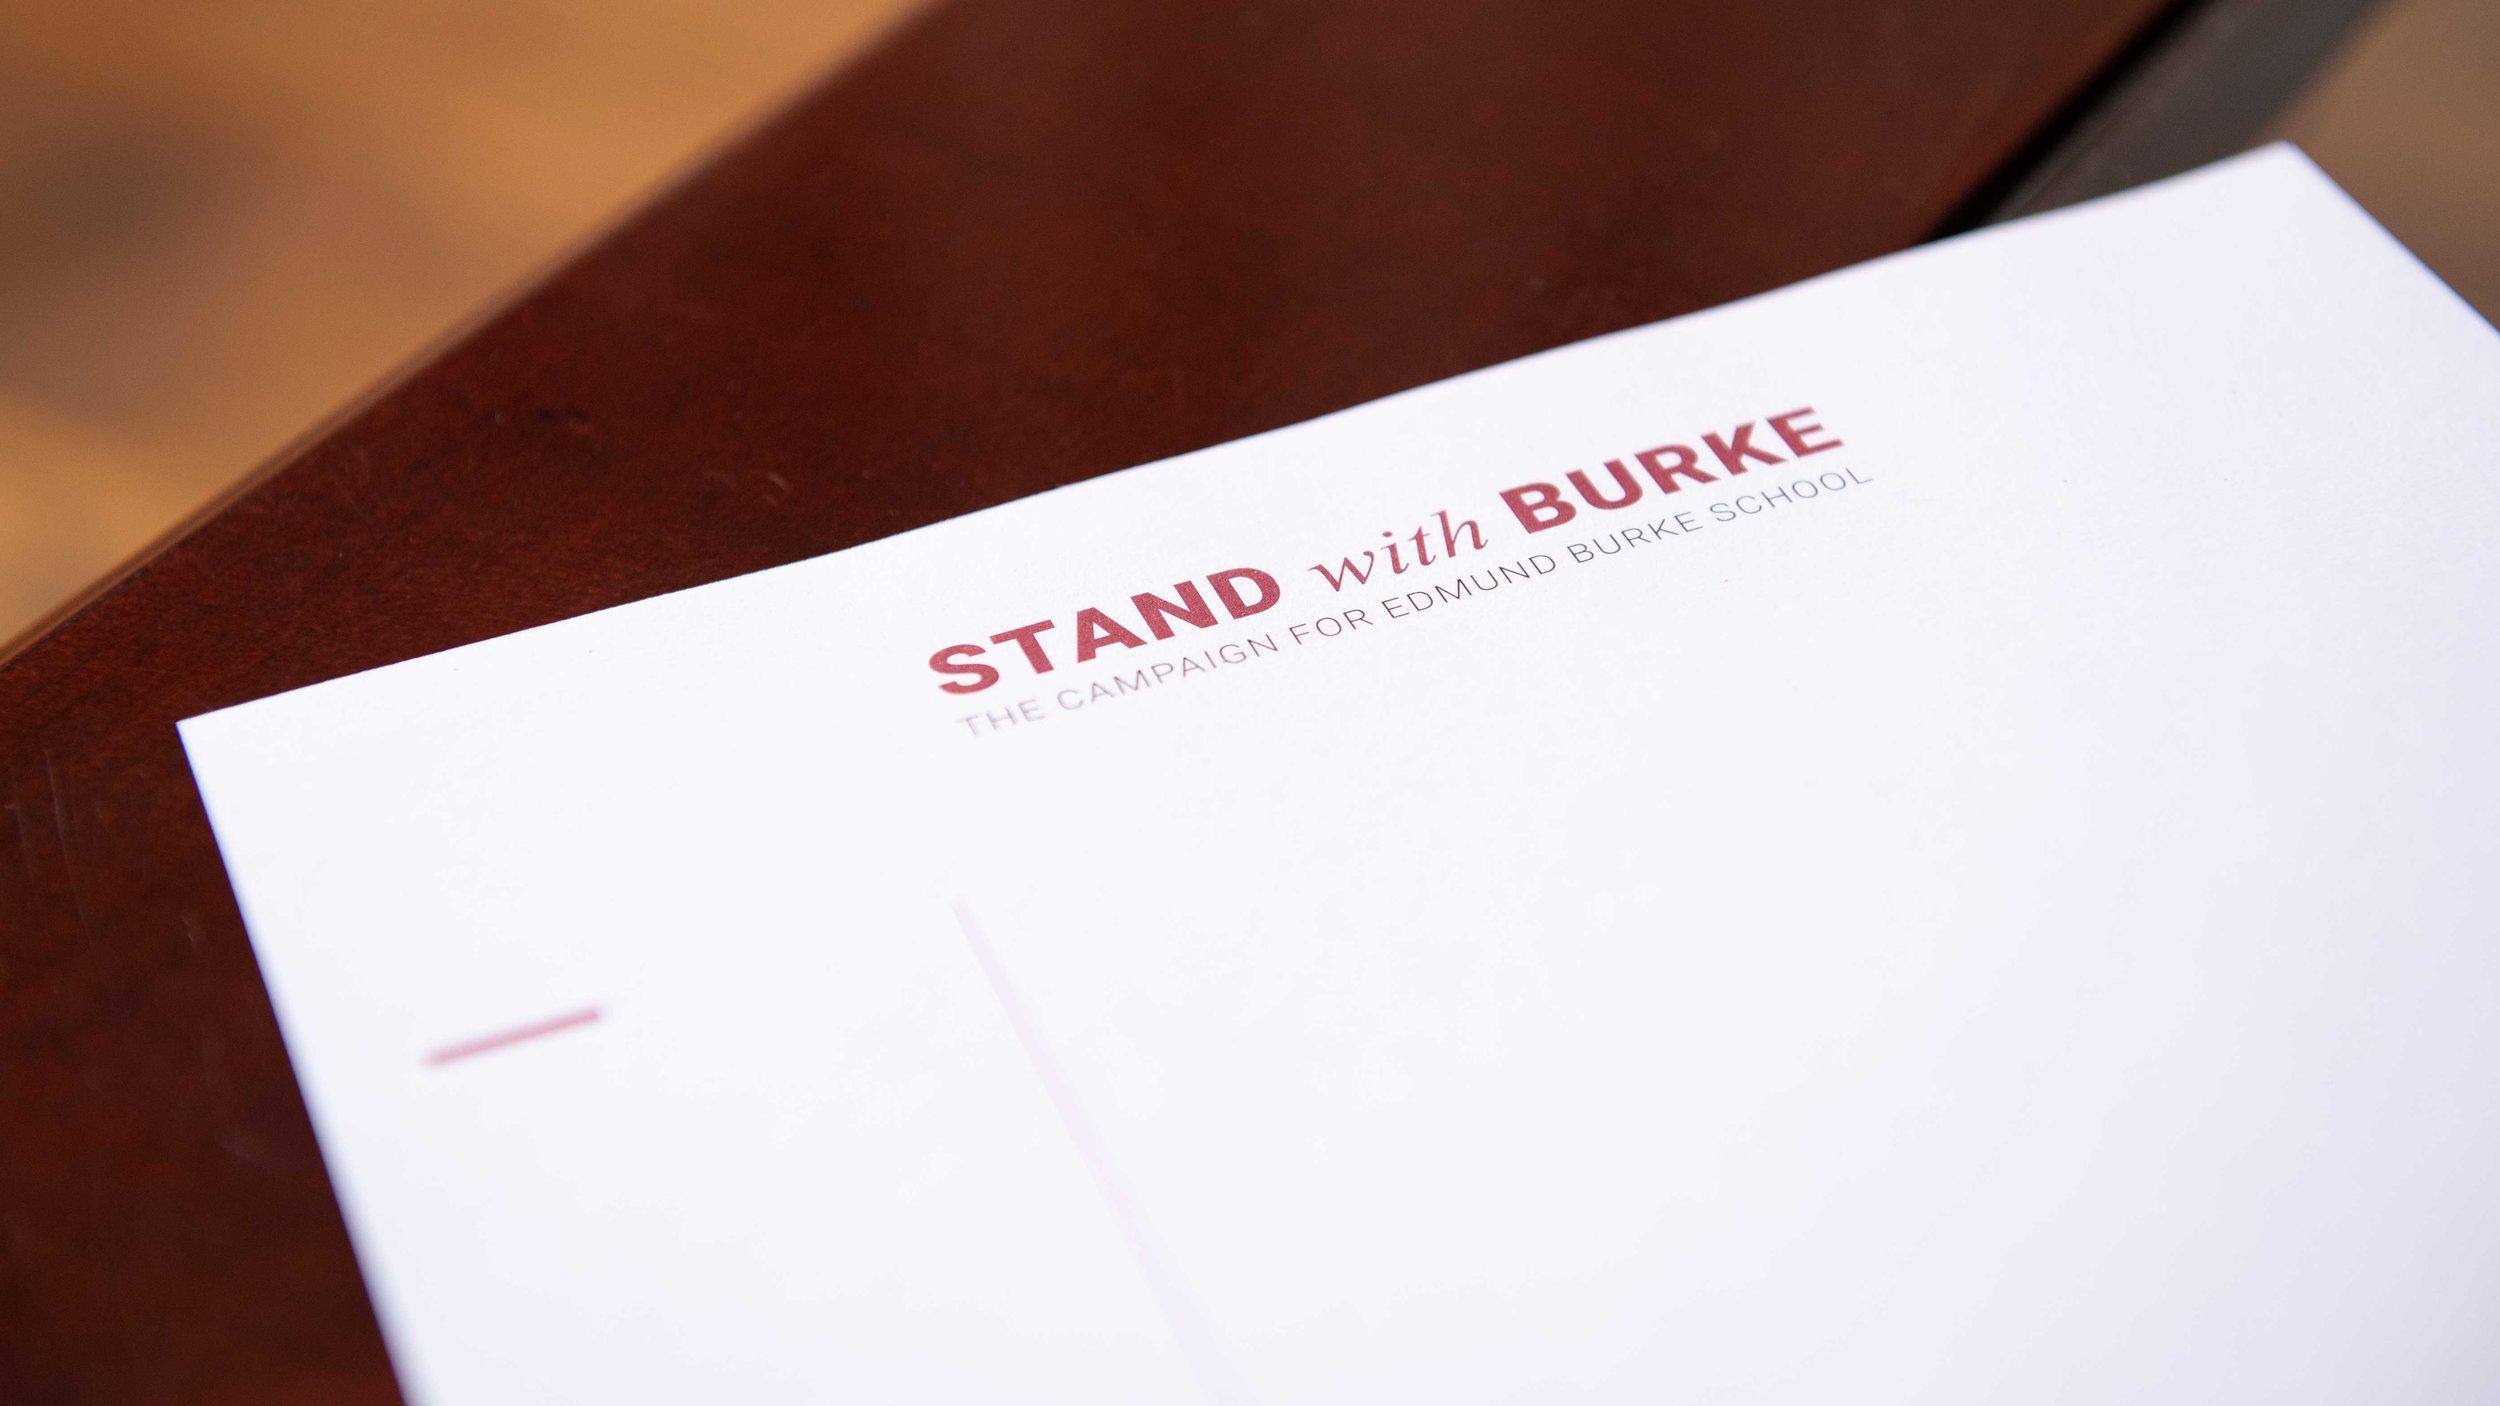 Edmund-Burke-School-Creosote-Affects-Capital-Campaign-Logo.jpg